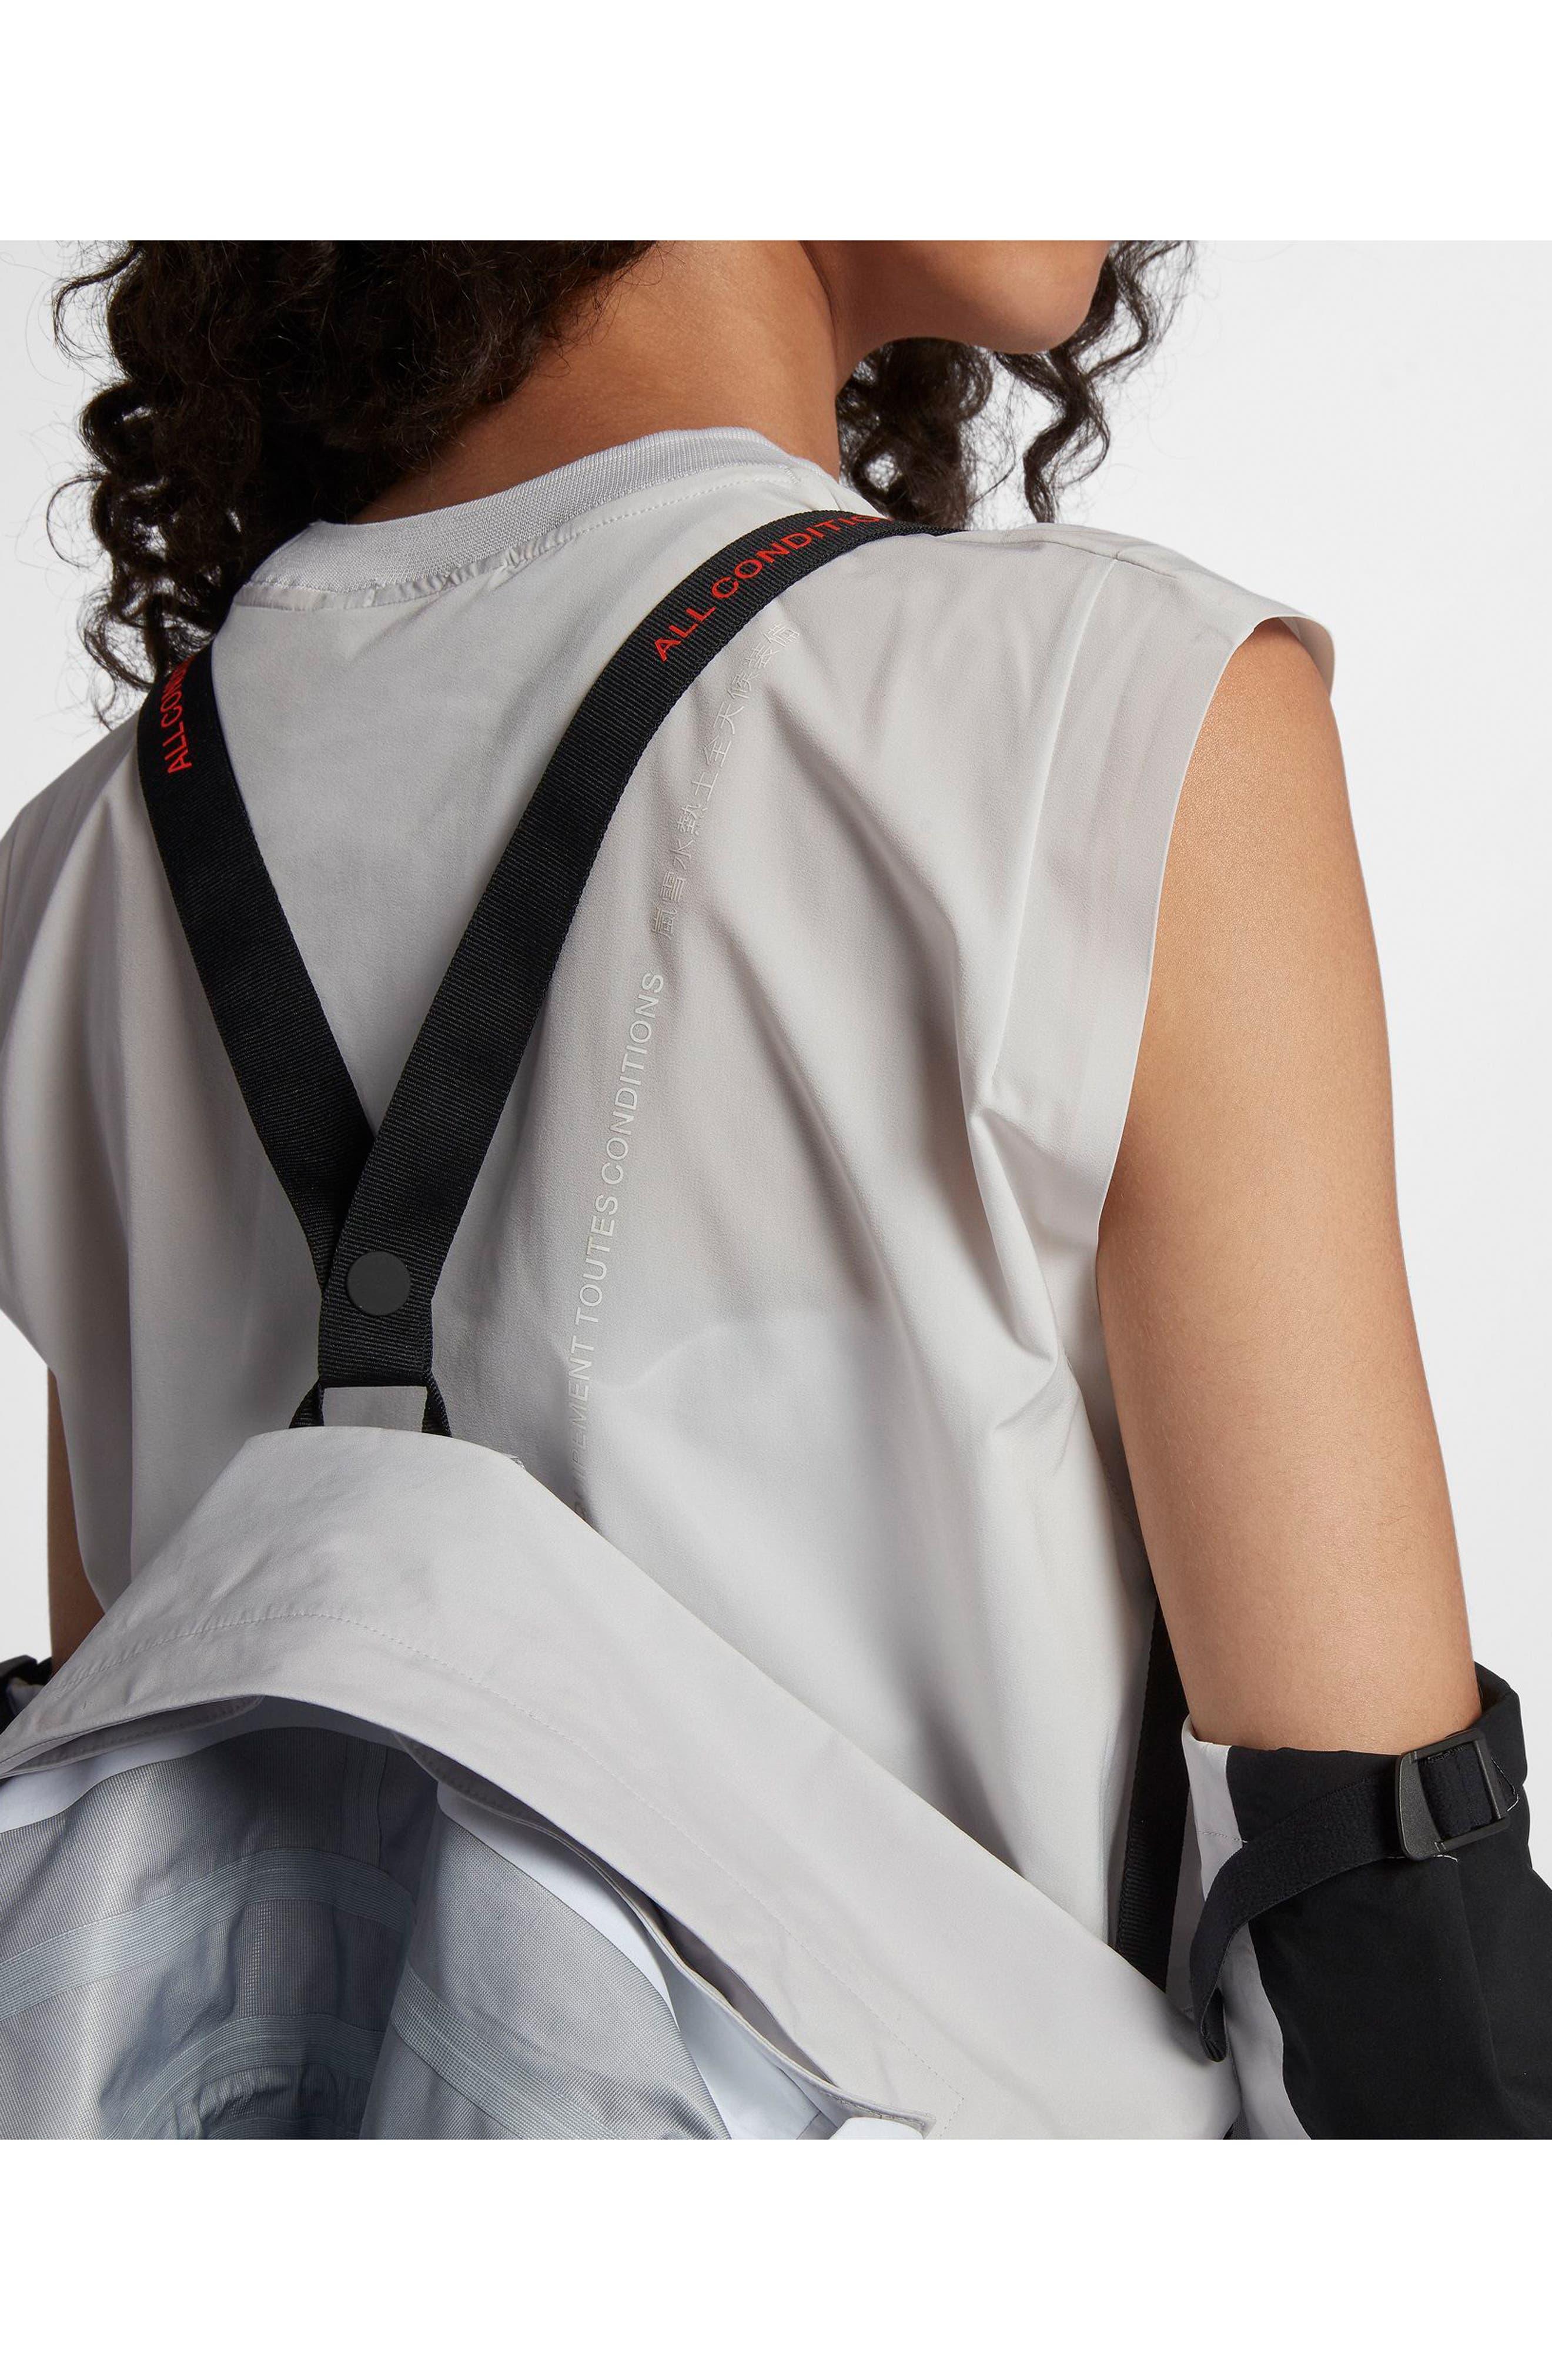 NikeLab ACG Gore-Tex<sup>®</sup> Women's Jacket,                             Alternate thumbnail 29, color,